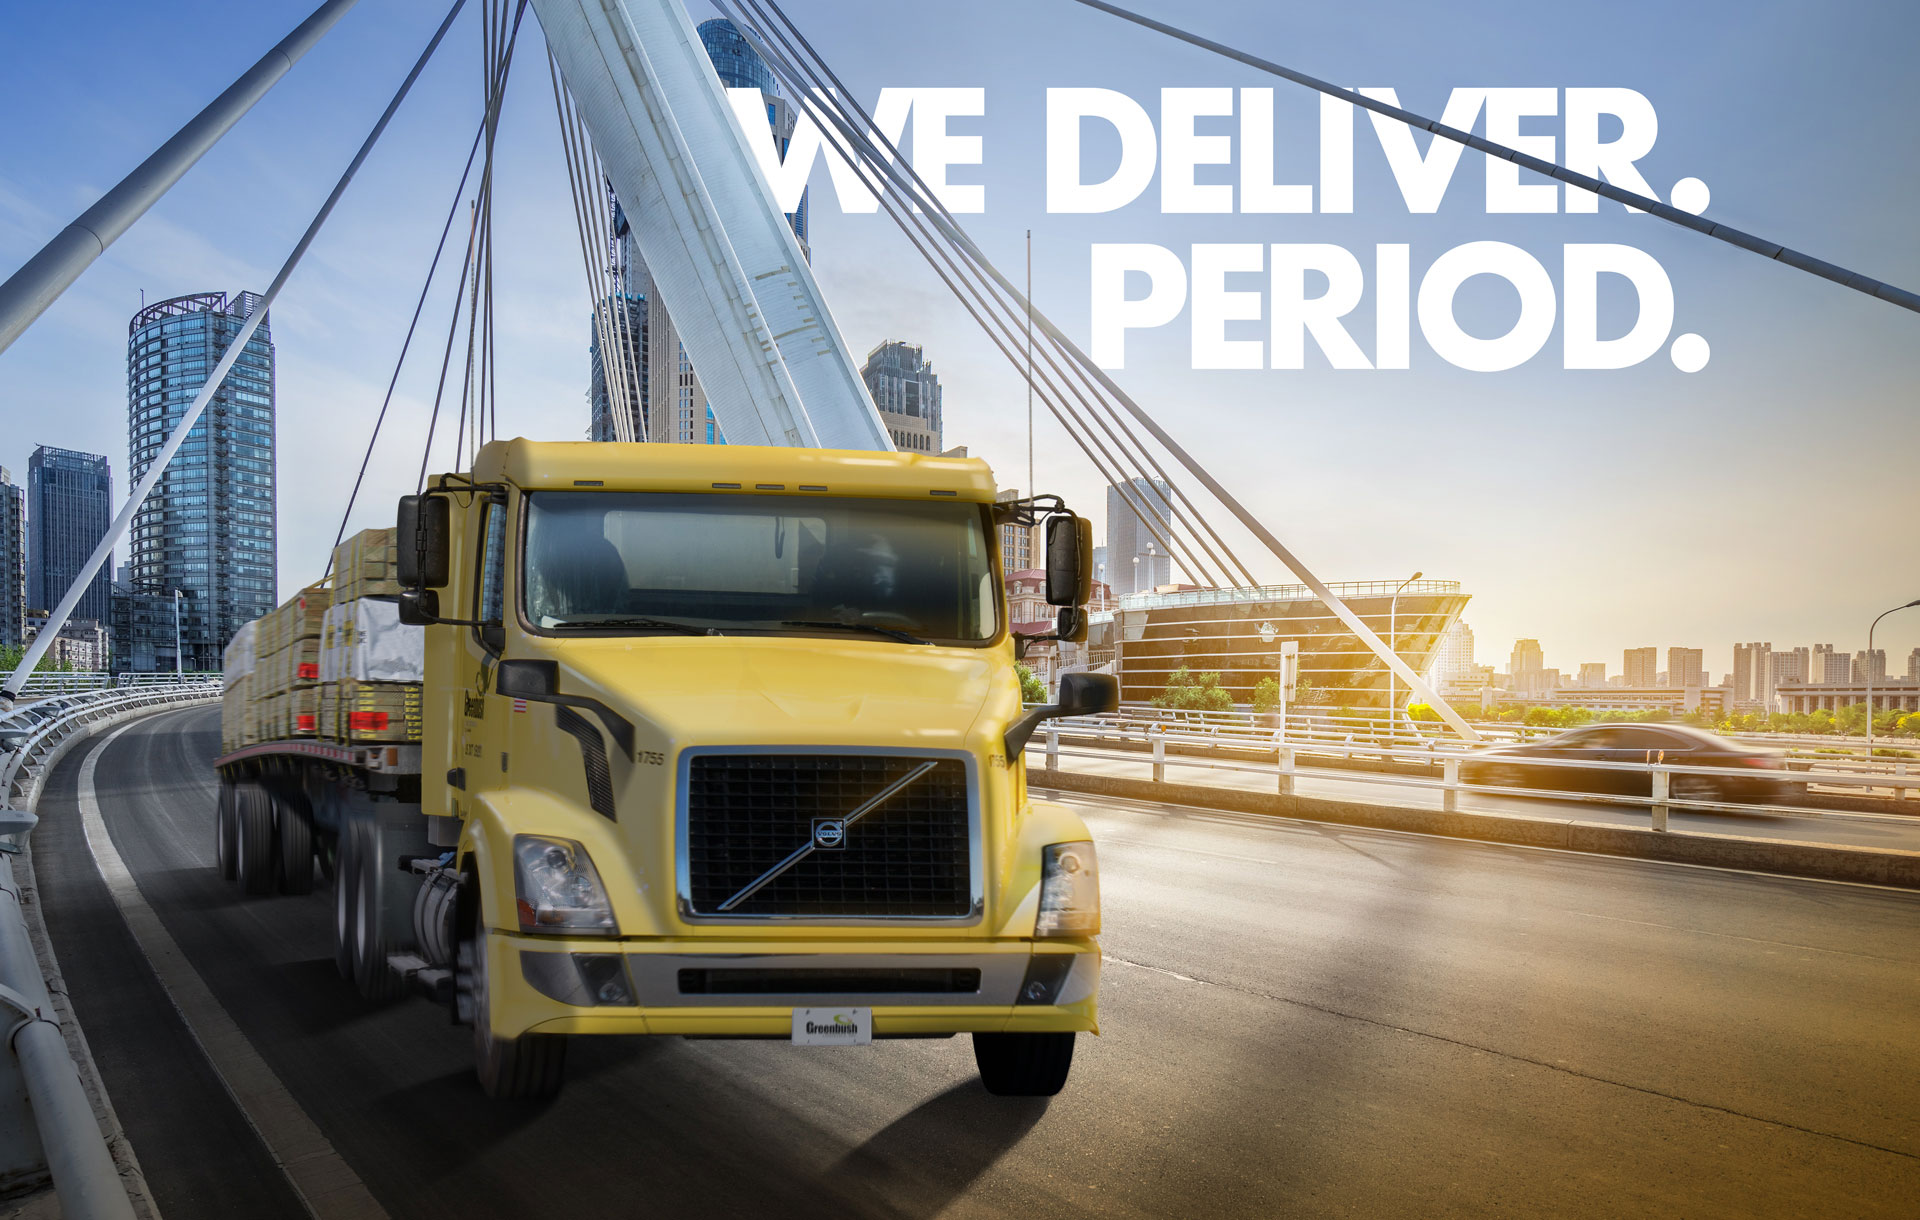 We Deliver Period